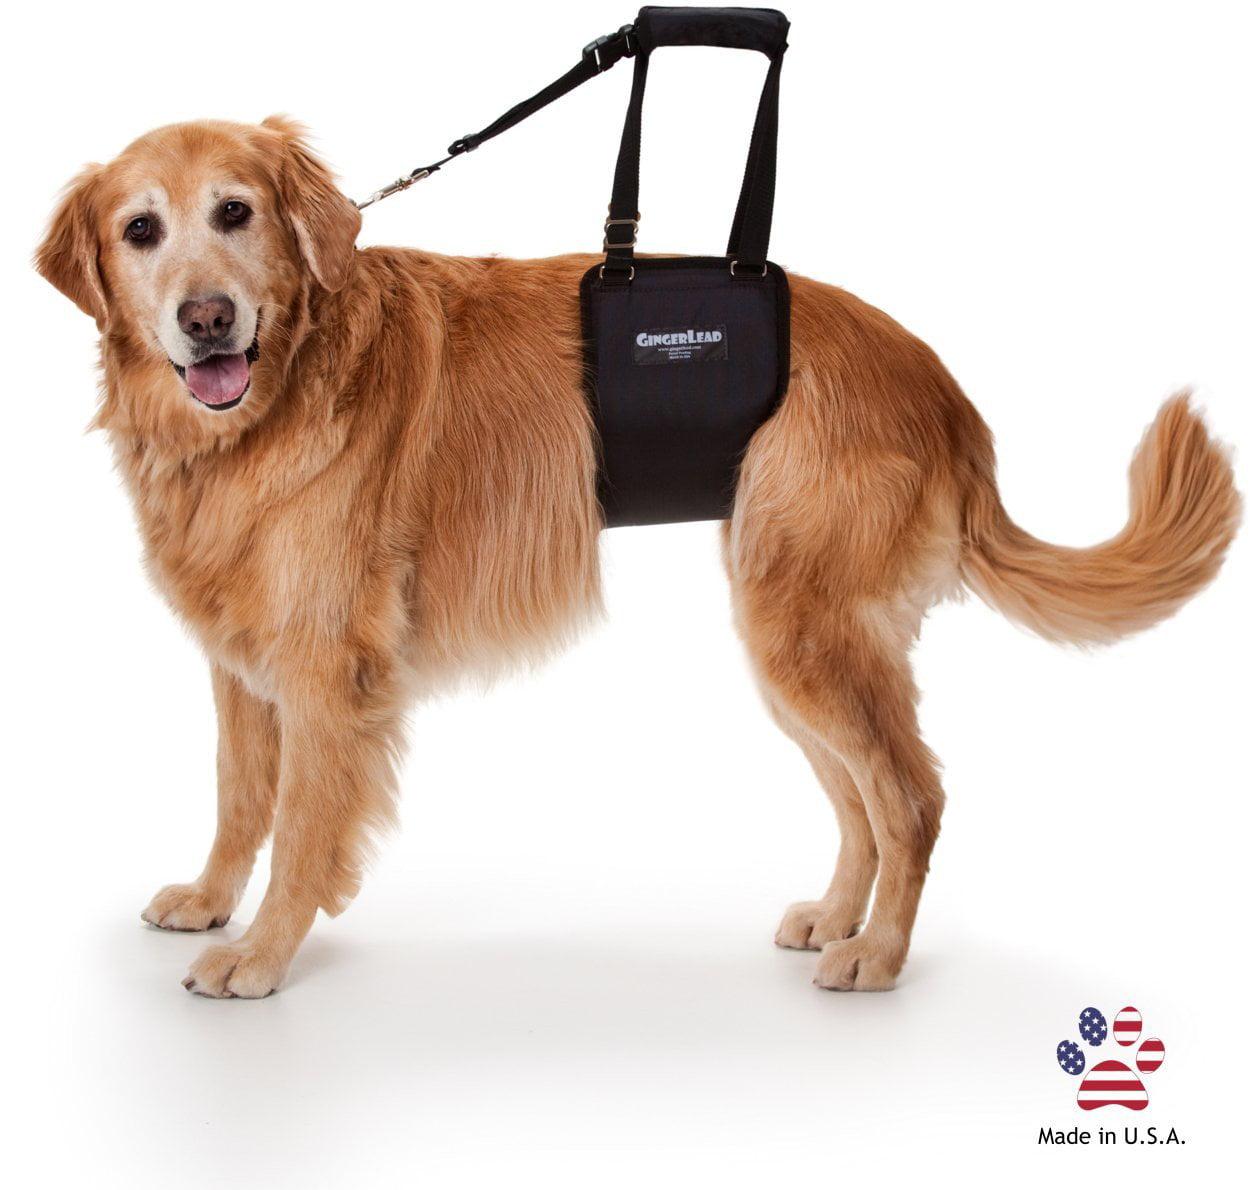 GingerLead Dog Support & Rehabilitation Harness - Large F...